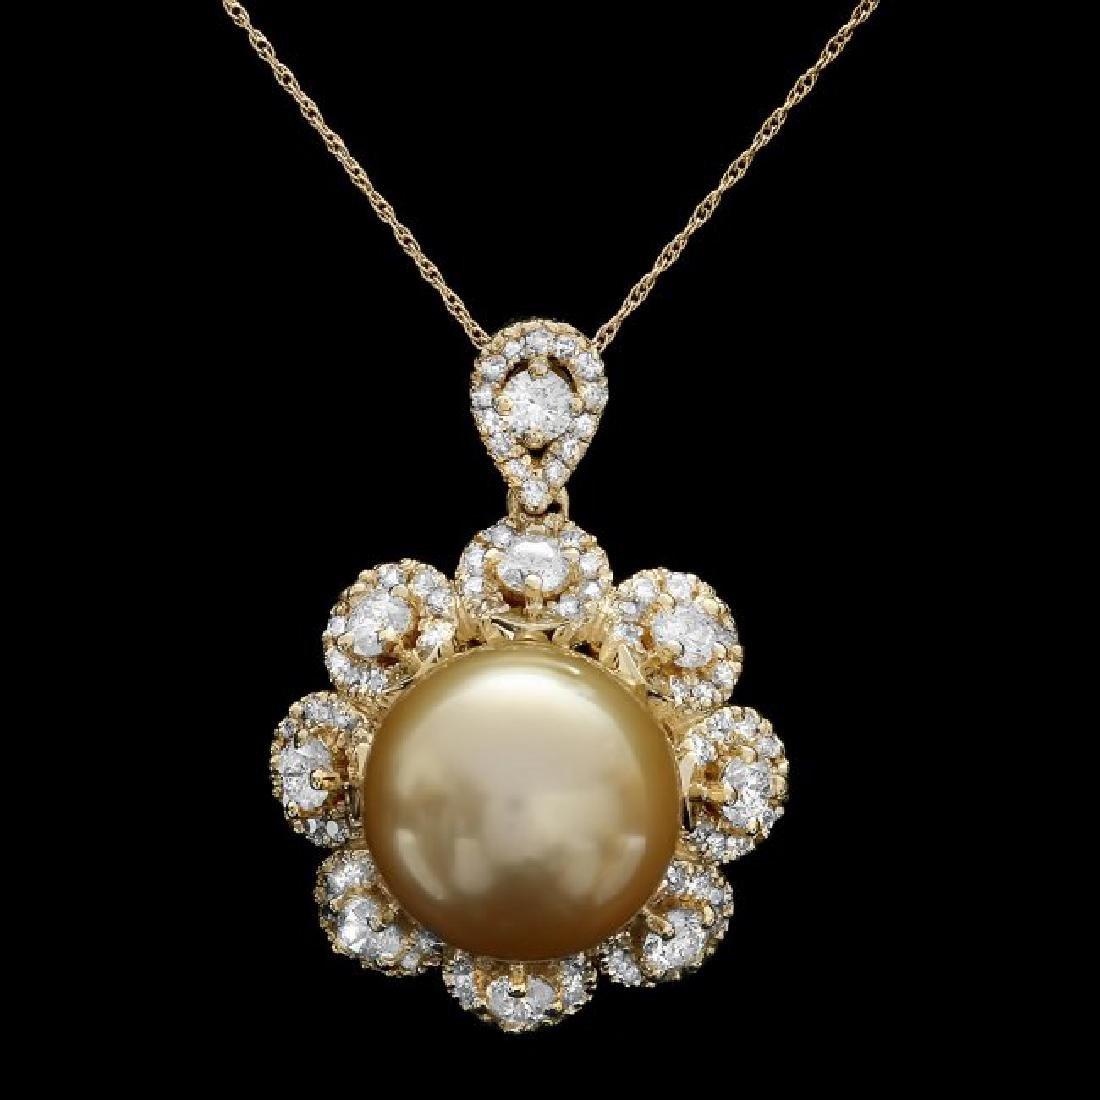 14k Yellow Gold 15mm Pearl 3.00ct Diamond Pendant - 2